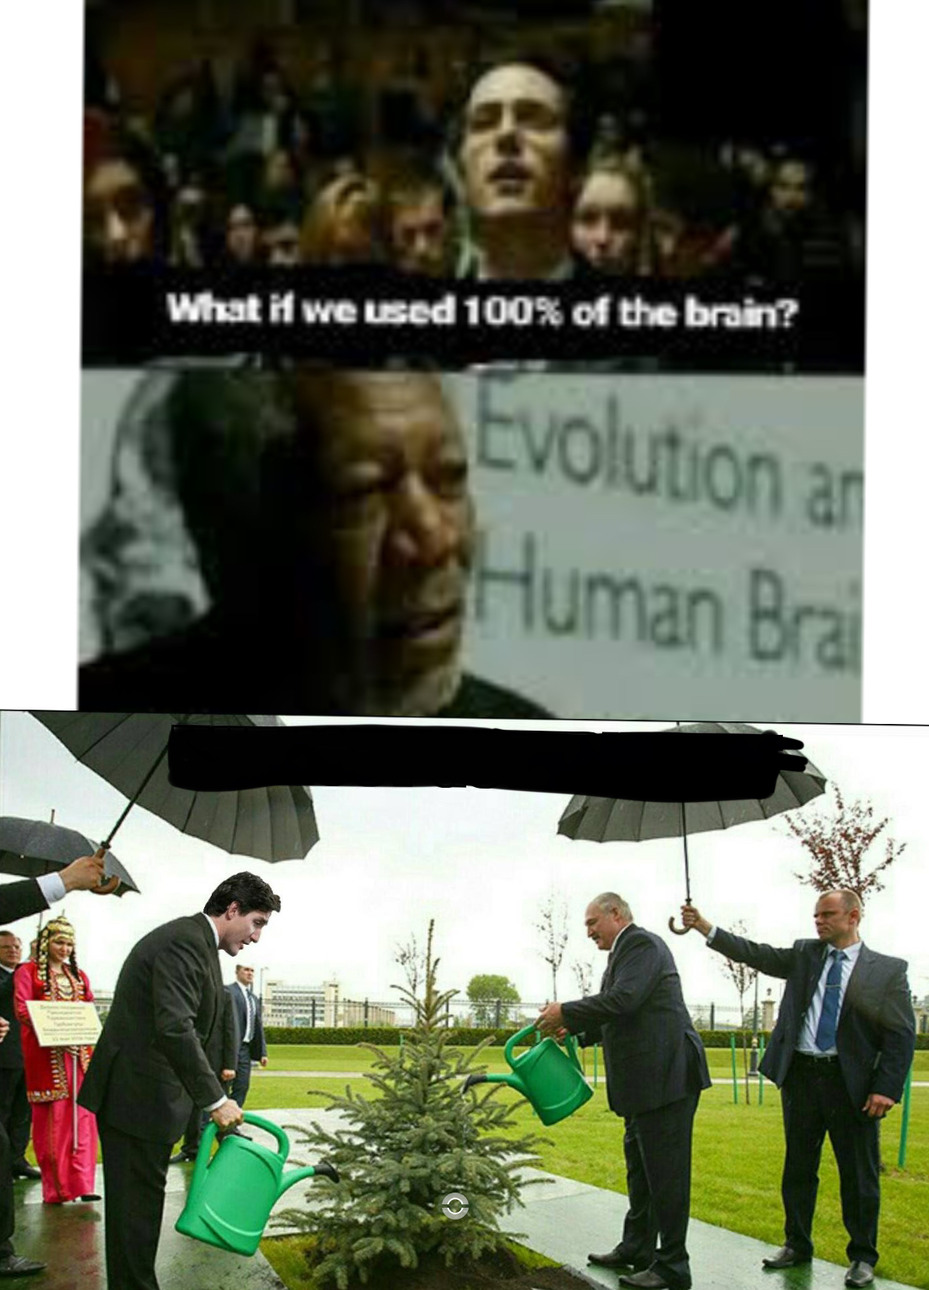 Stupidity am I right? - meme